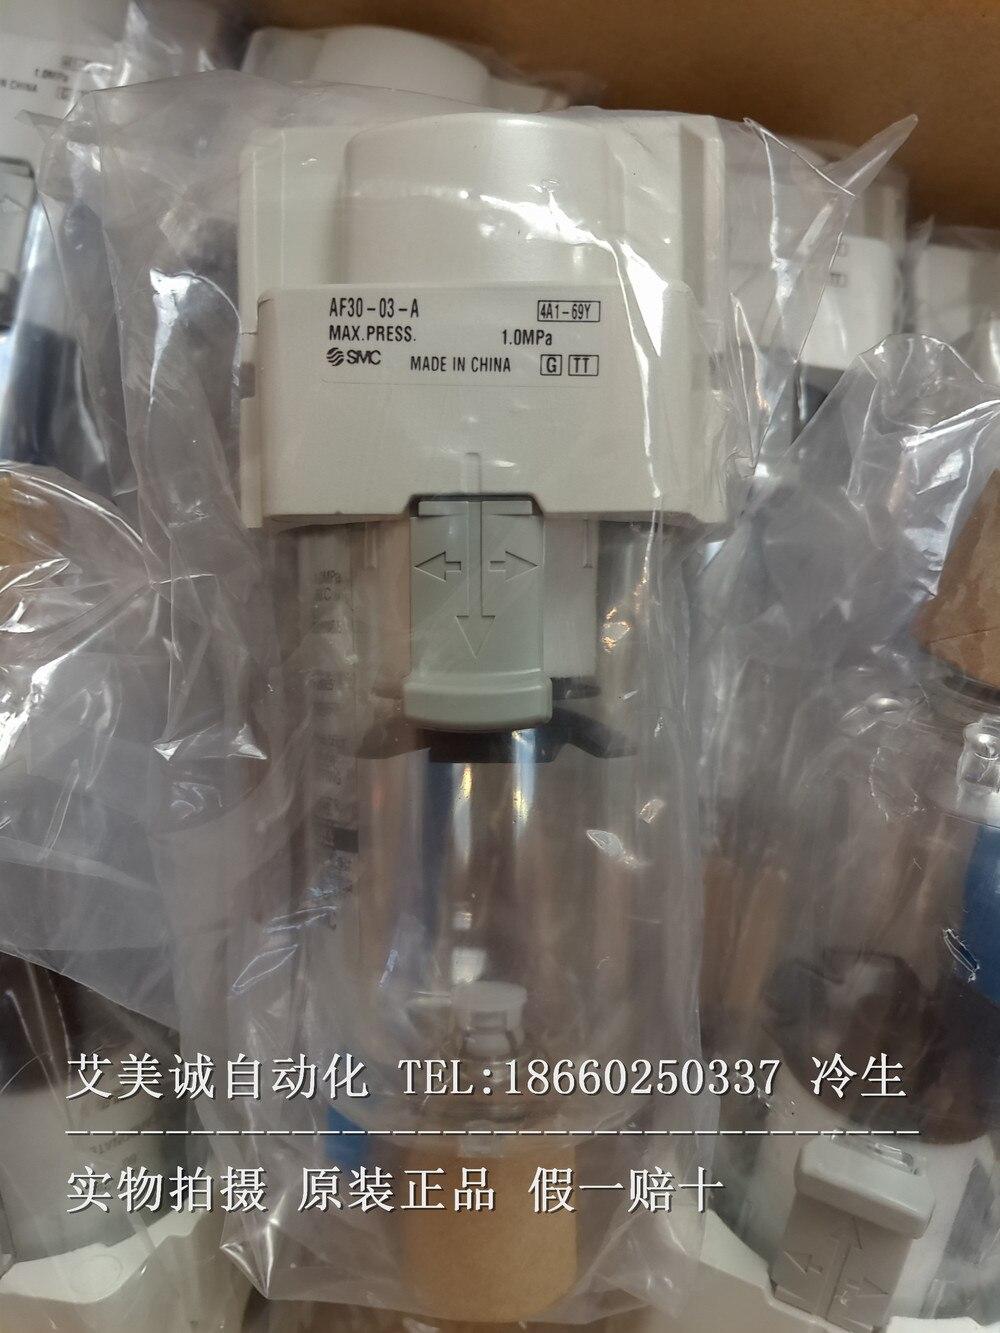 SMC filter AF30-03-A new original genuine new original smc vacuum filter zfc76 zfc series